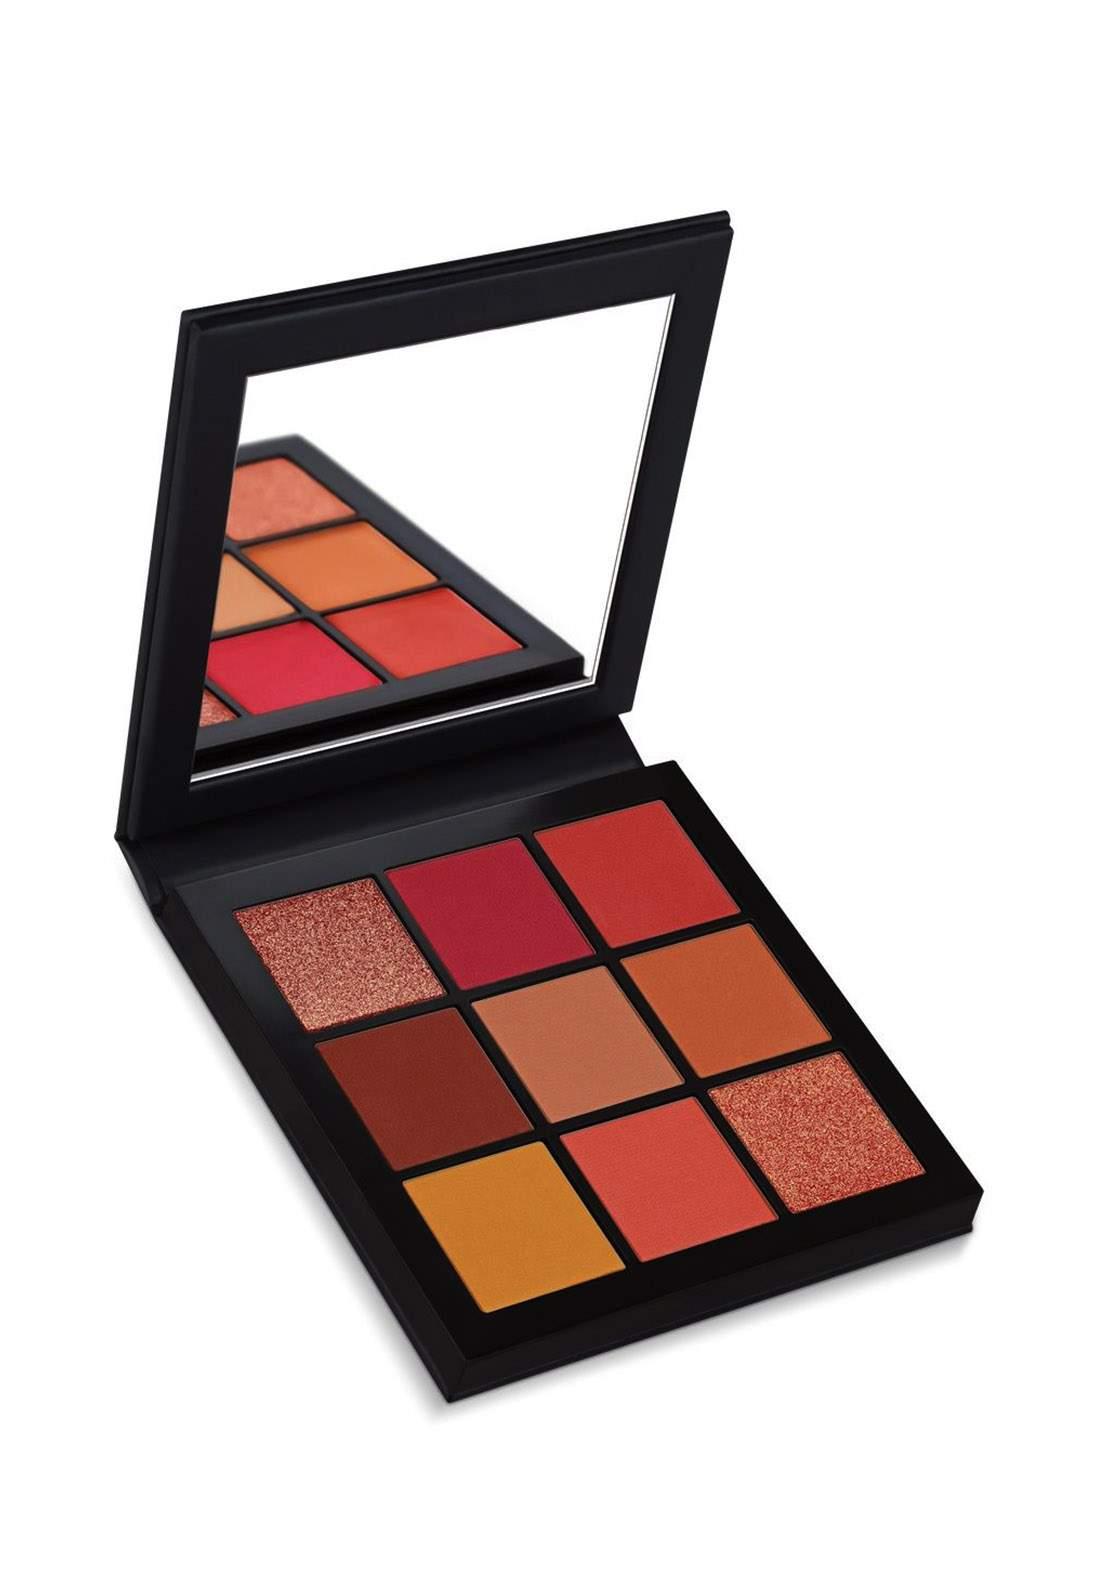 Huda Beauty Obsessions Eyeshadow Palette Coral 10g علبة ظلال